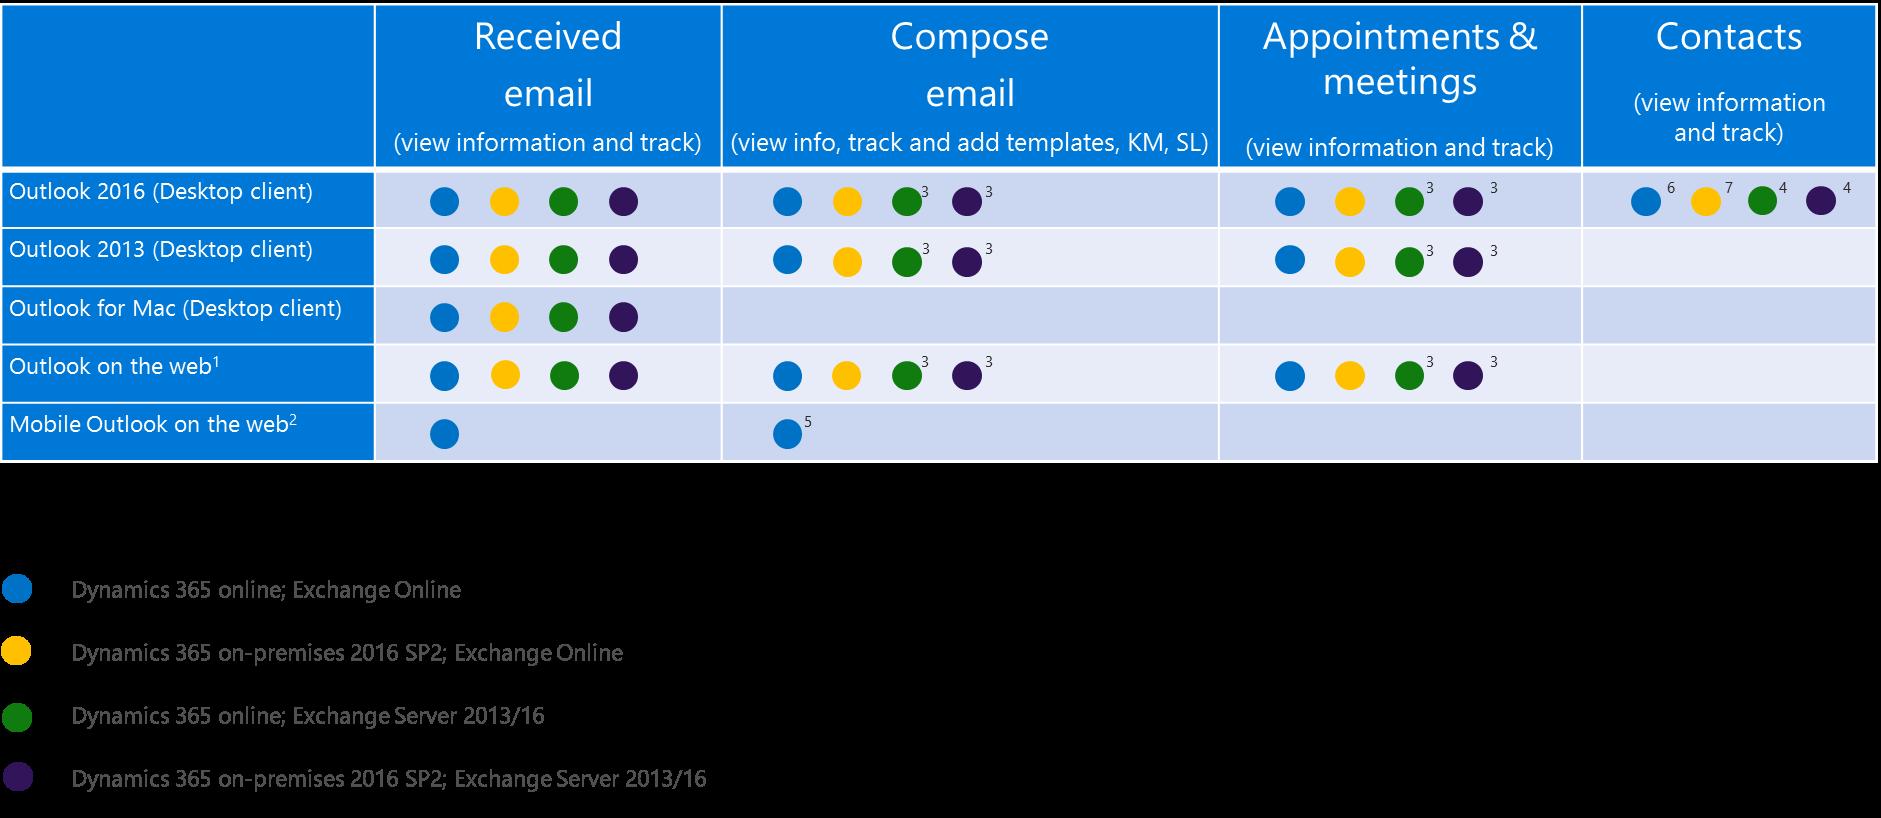 Dynamics 365 App for Outlook support matrix